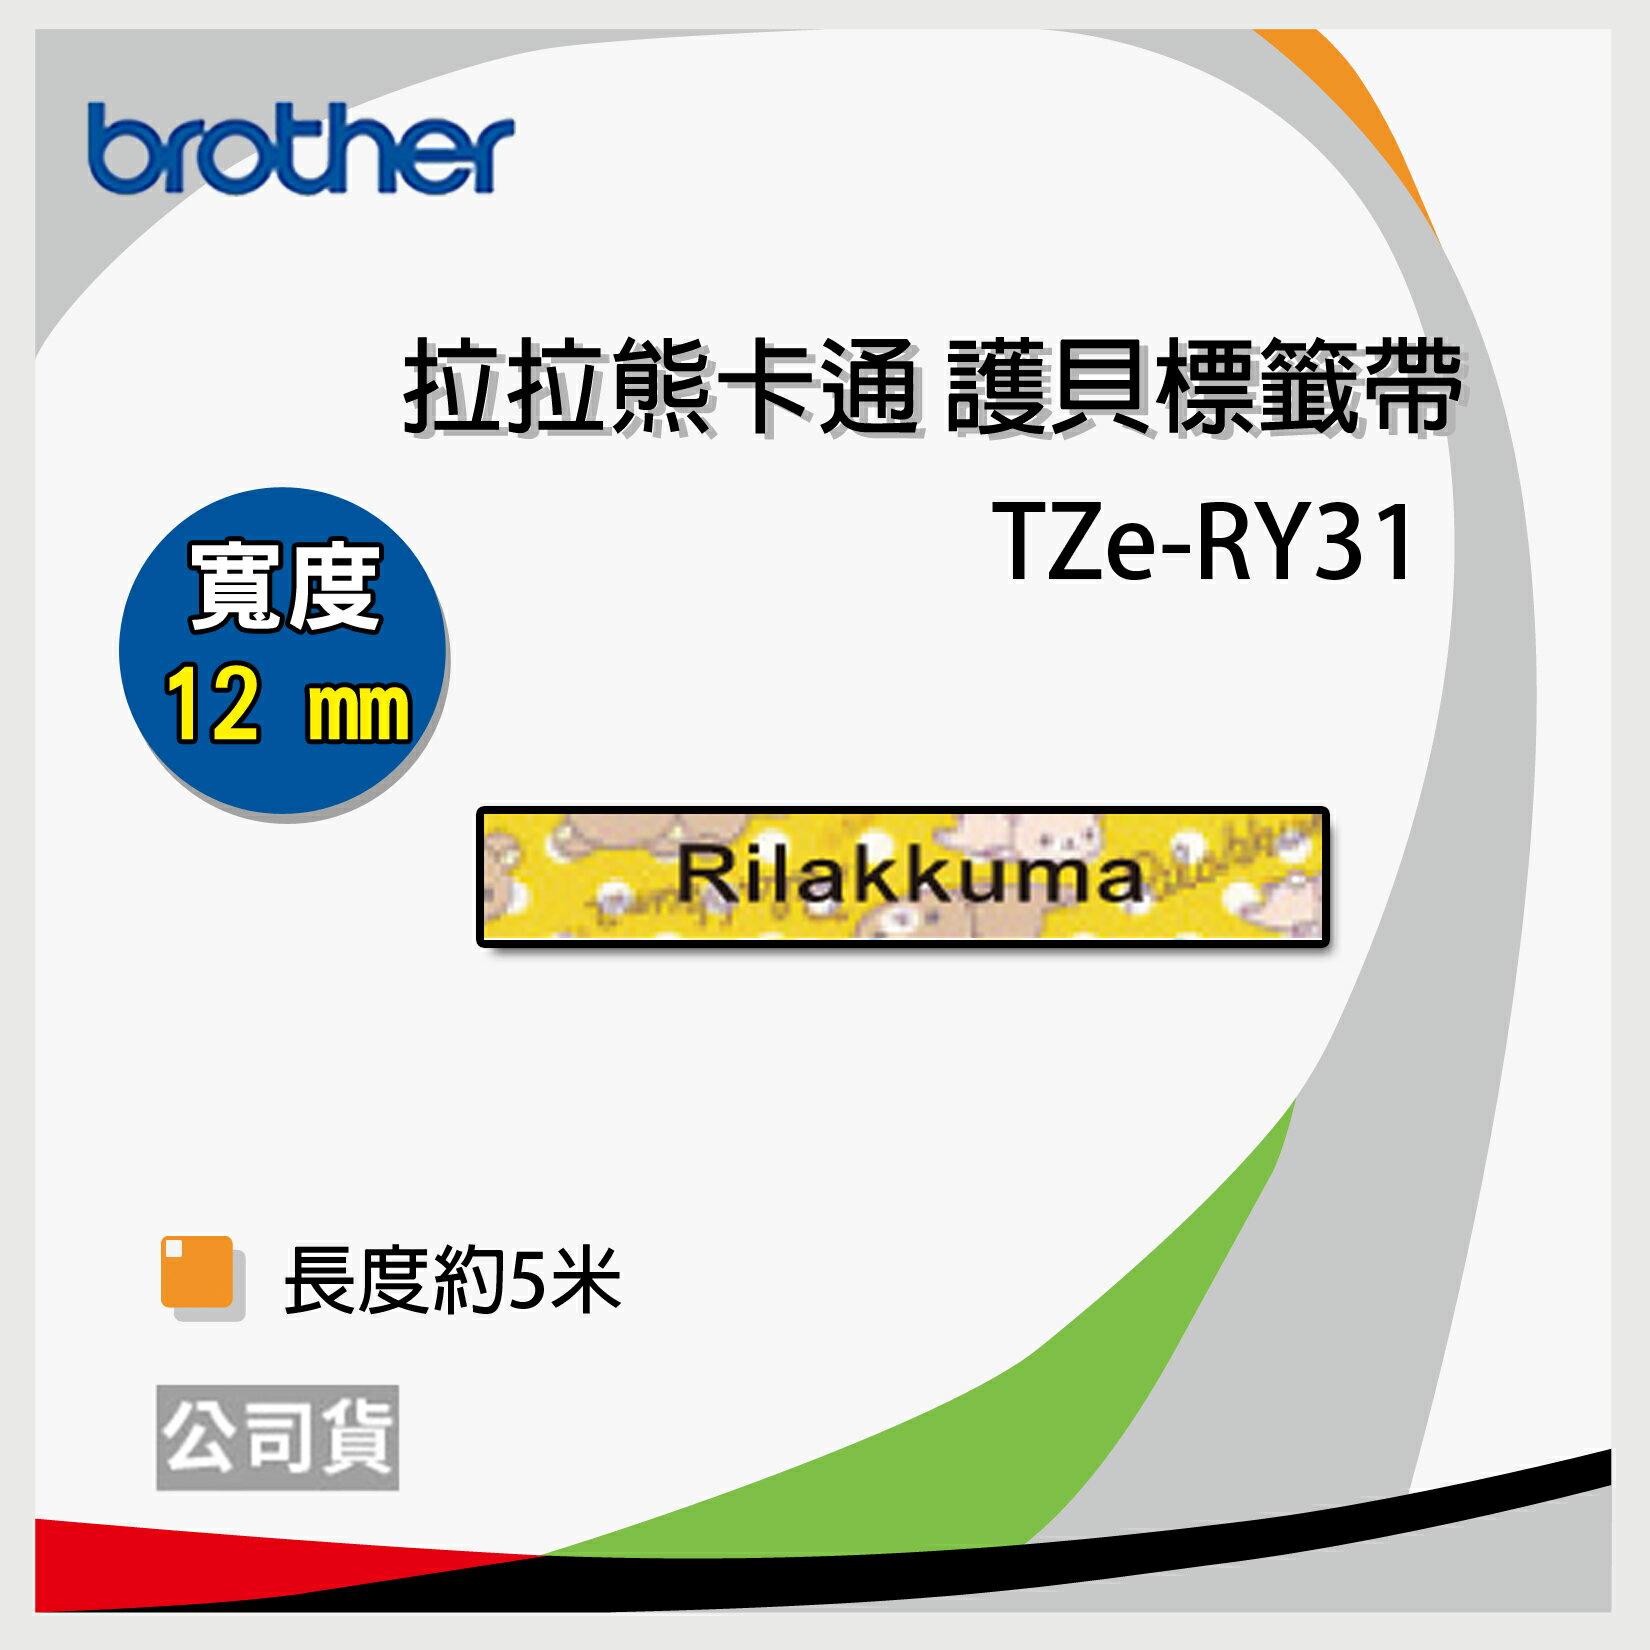 Brother 12mm 原廠卡通護貝標籤帶 Rilakkuma 拉拉熊 TZe-RY31 黃色黑字